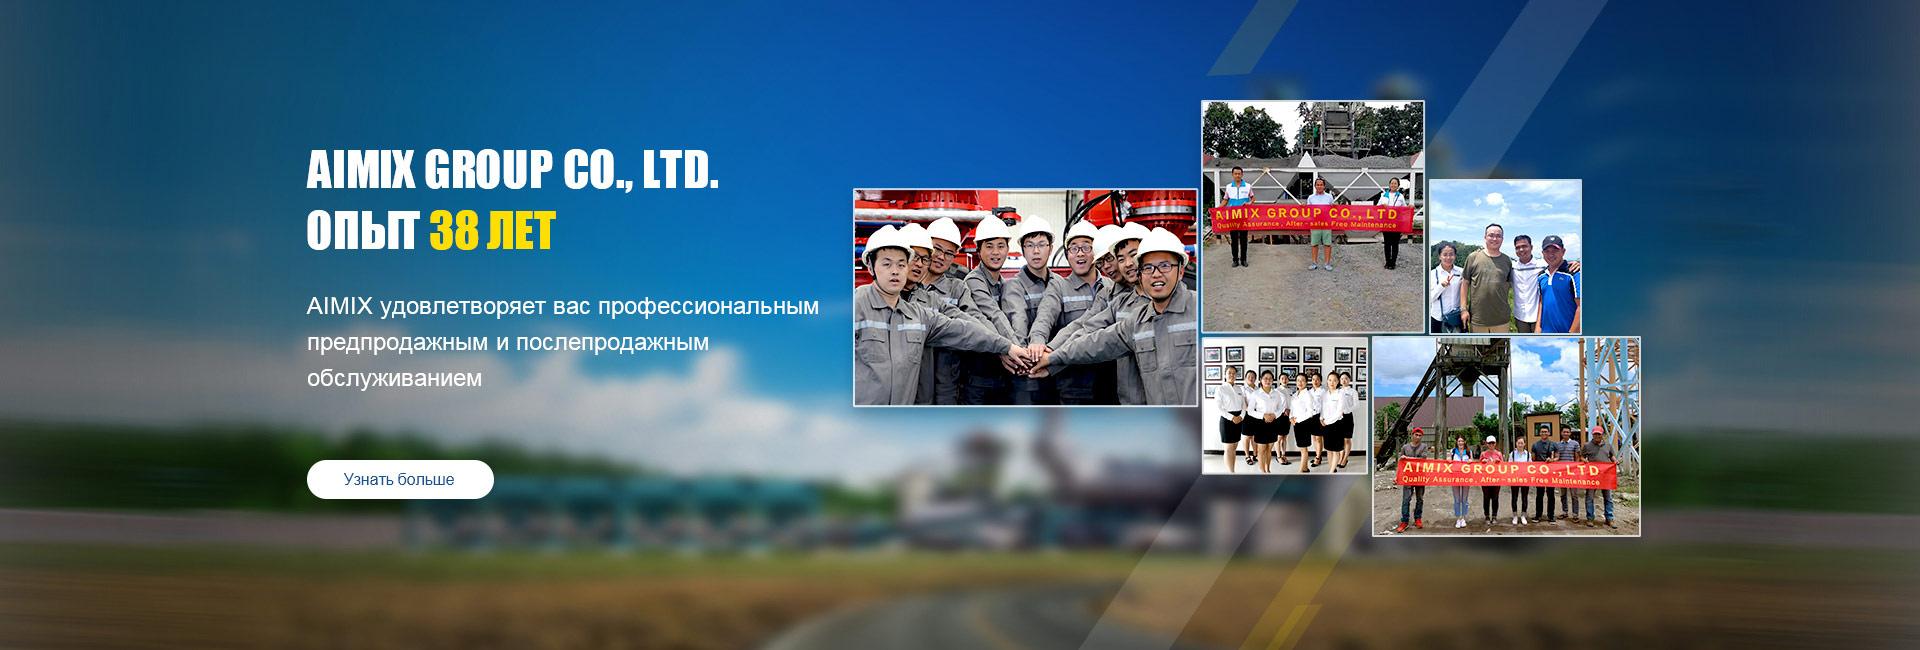 Aimix Group Service